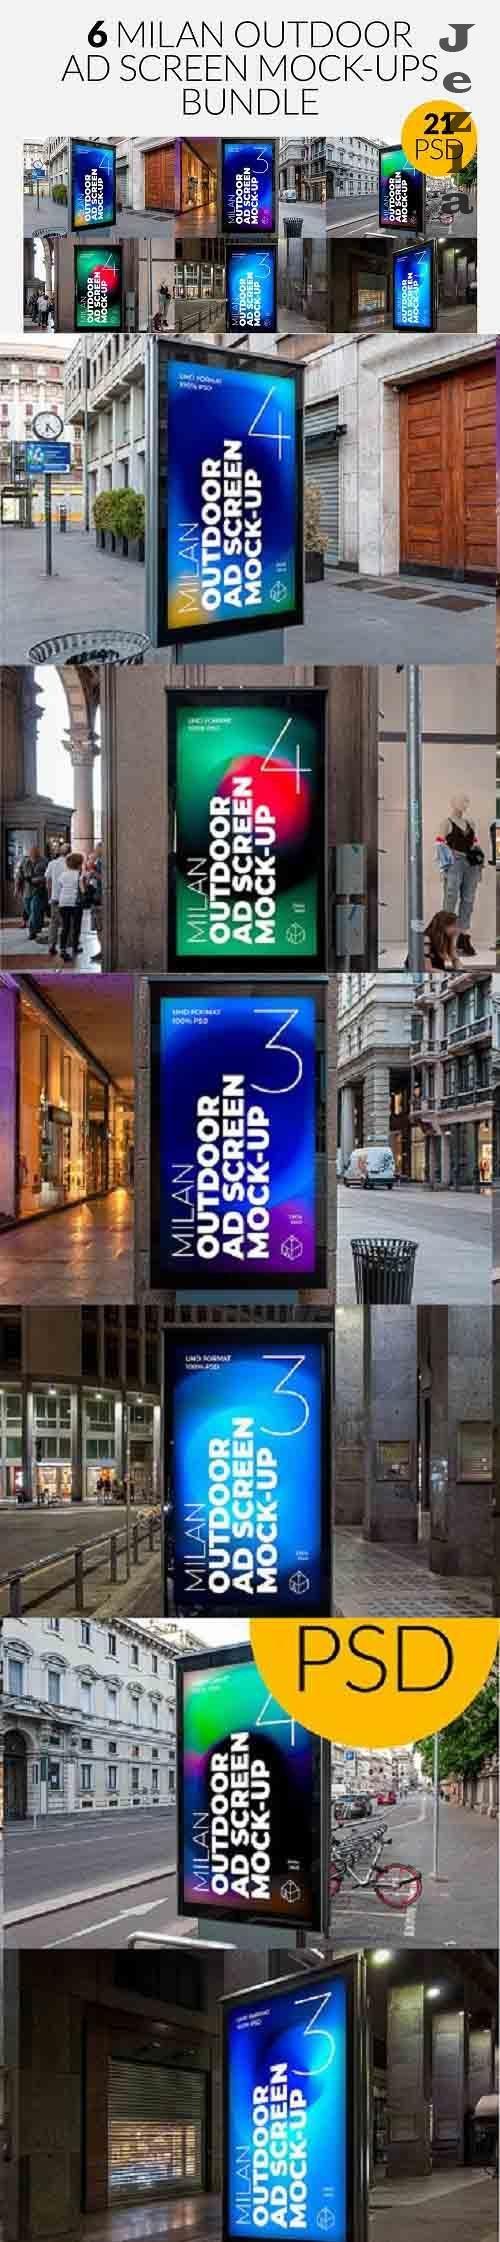 CreativeMarket - Milan Outdoor Ad Screen MockUps Set 5471499